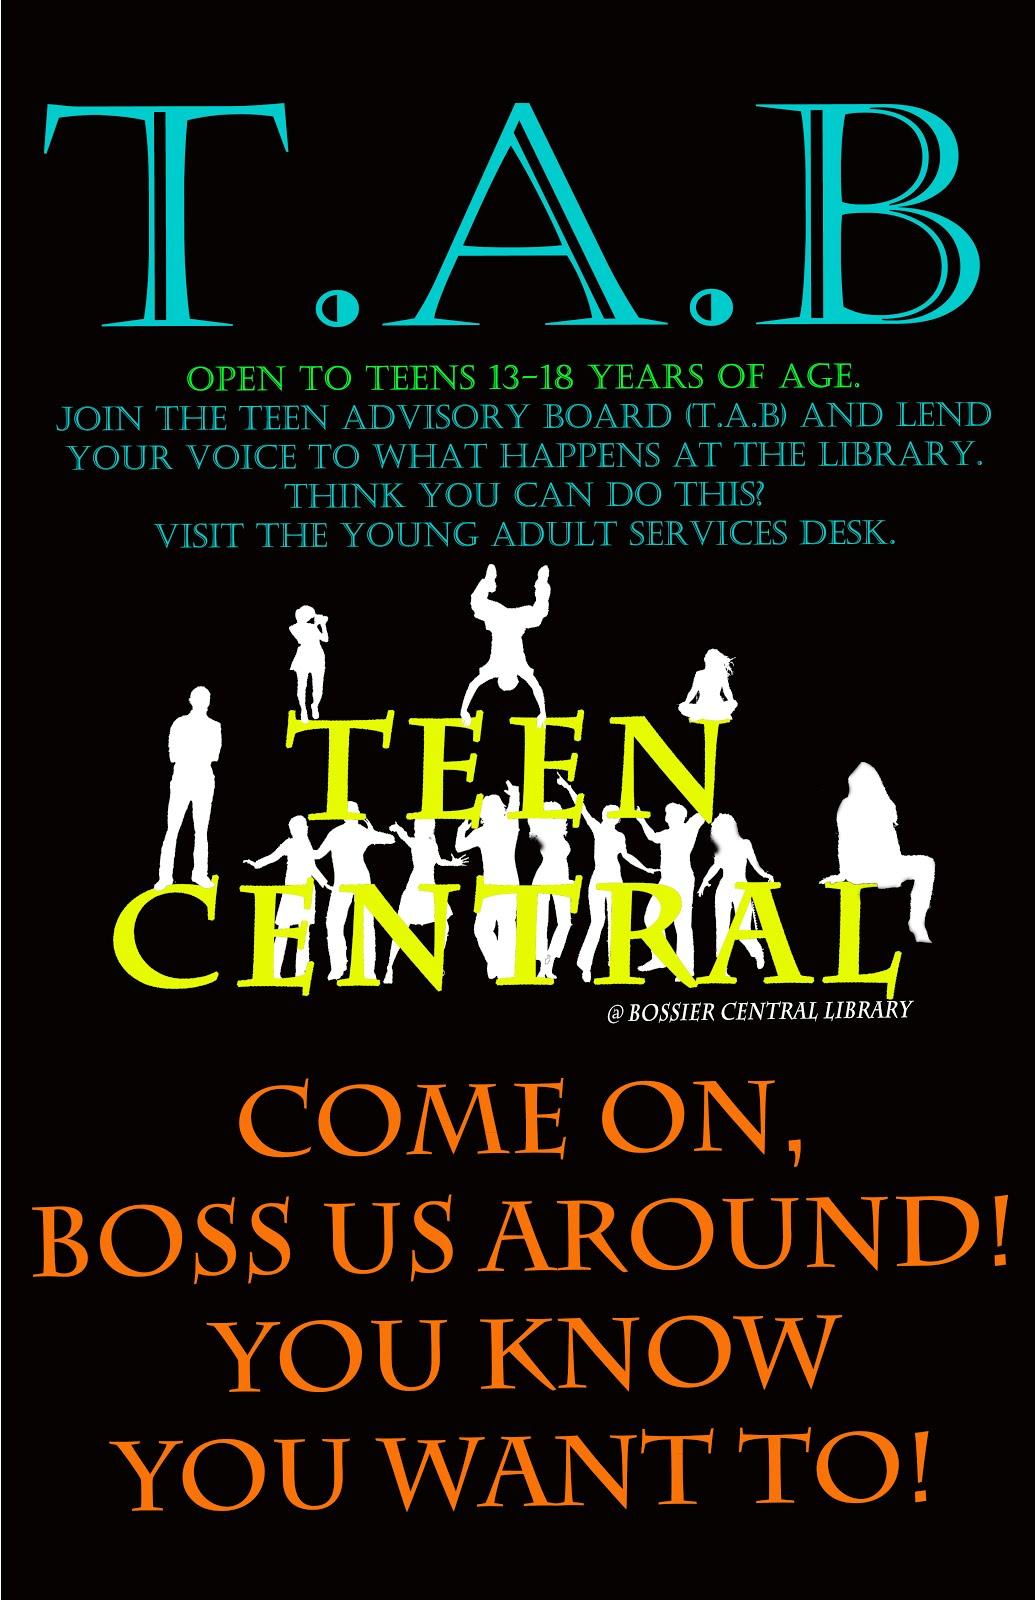 Join the Teen Advisory Board